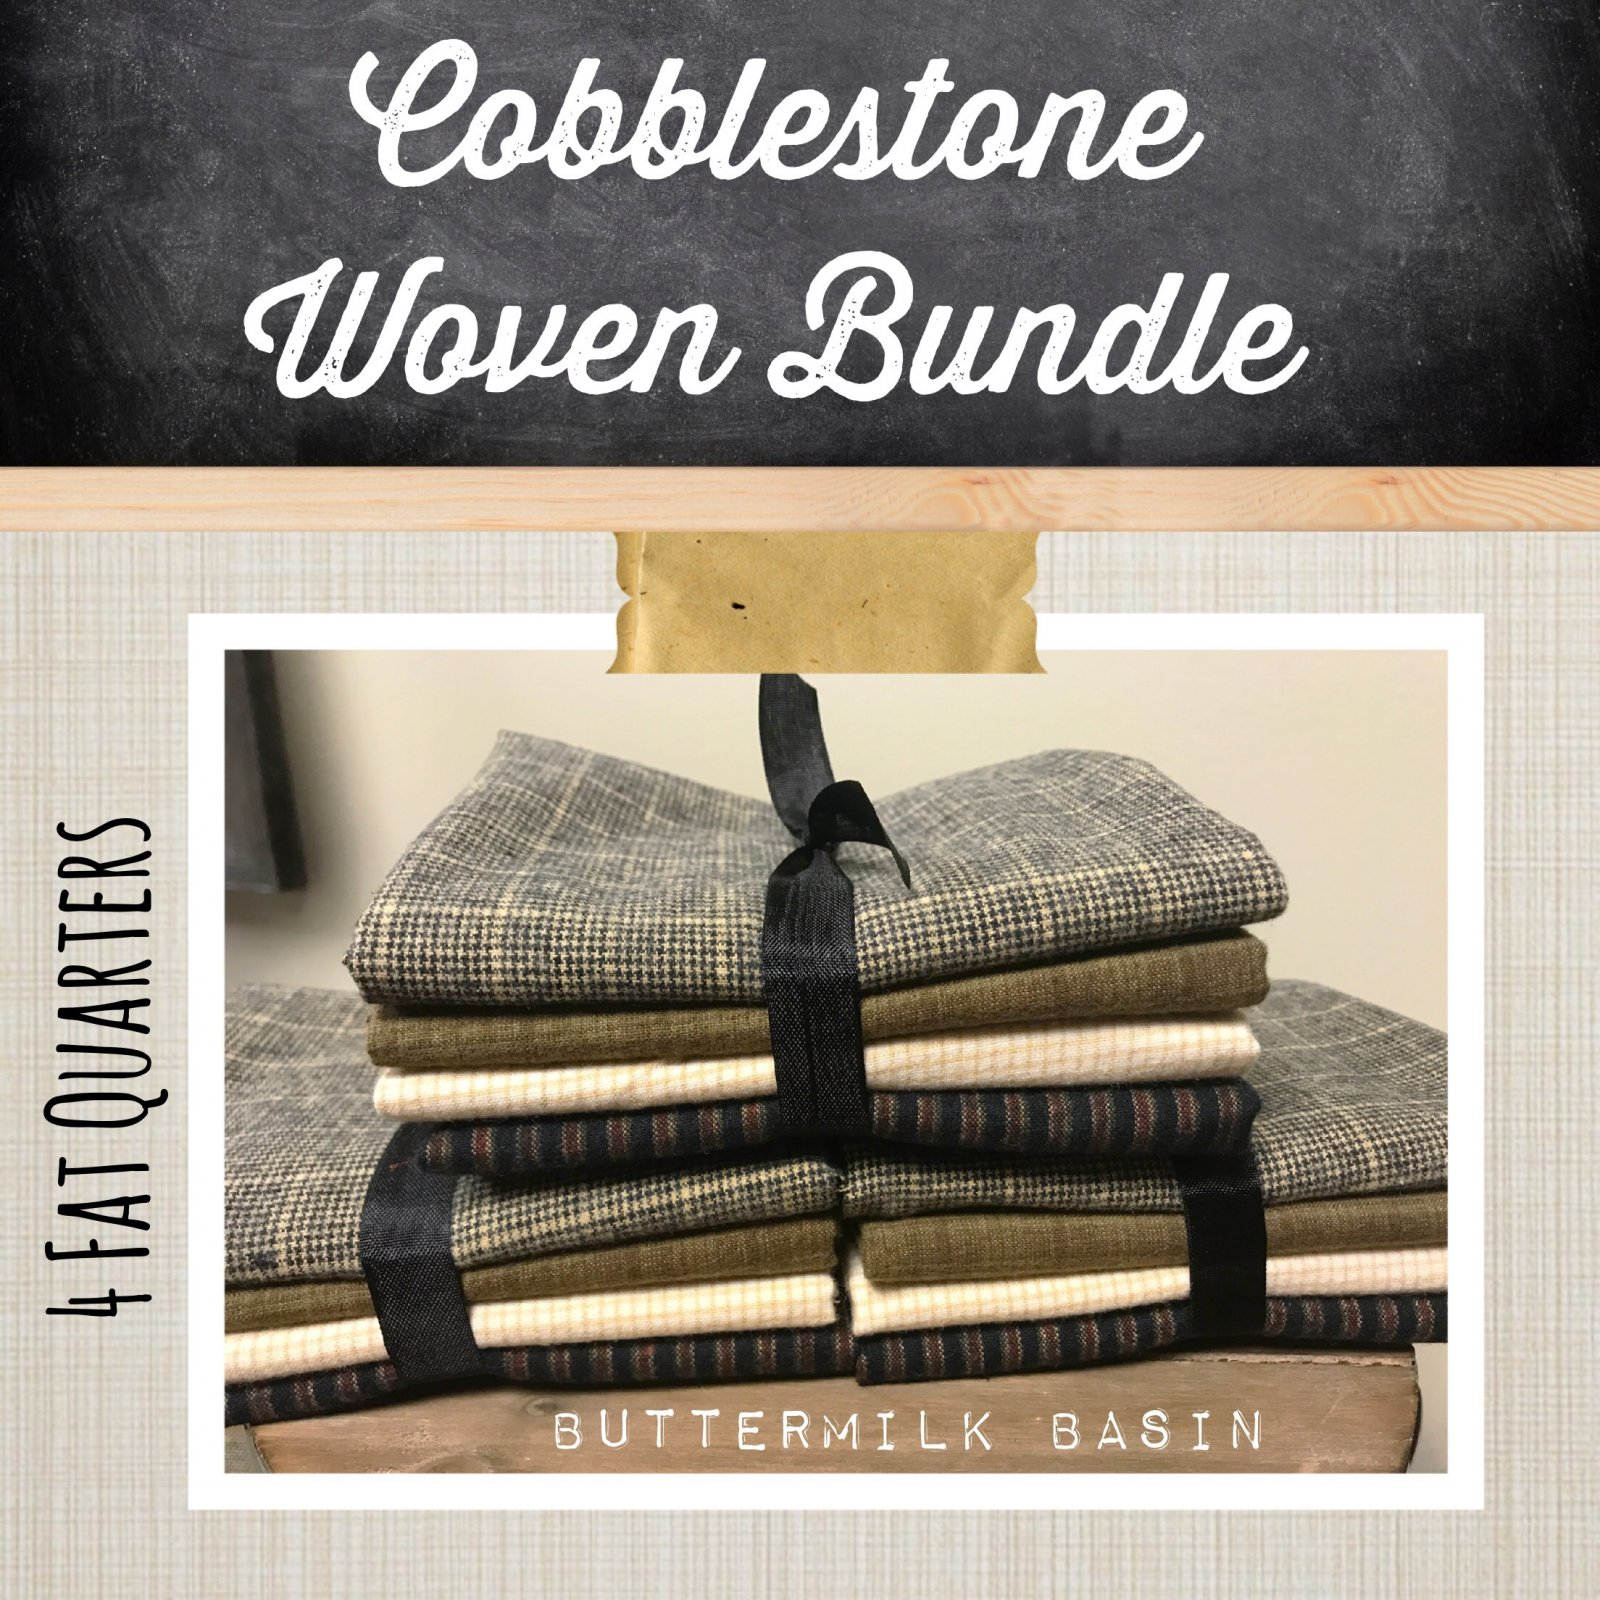 Cobblestone Woven Bundle